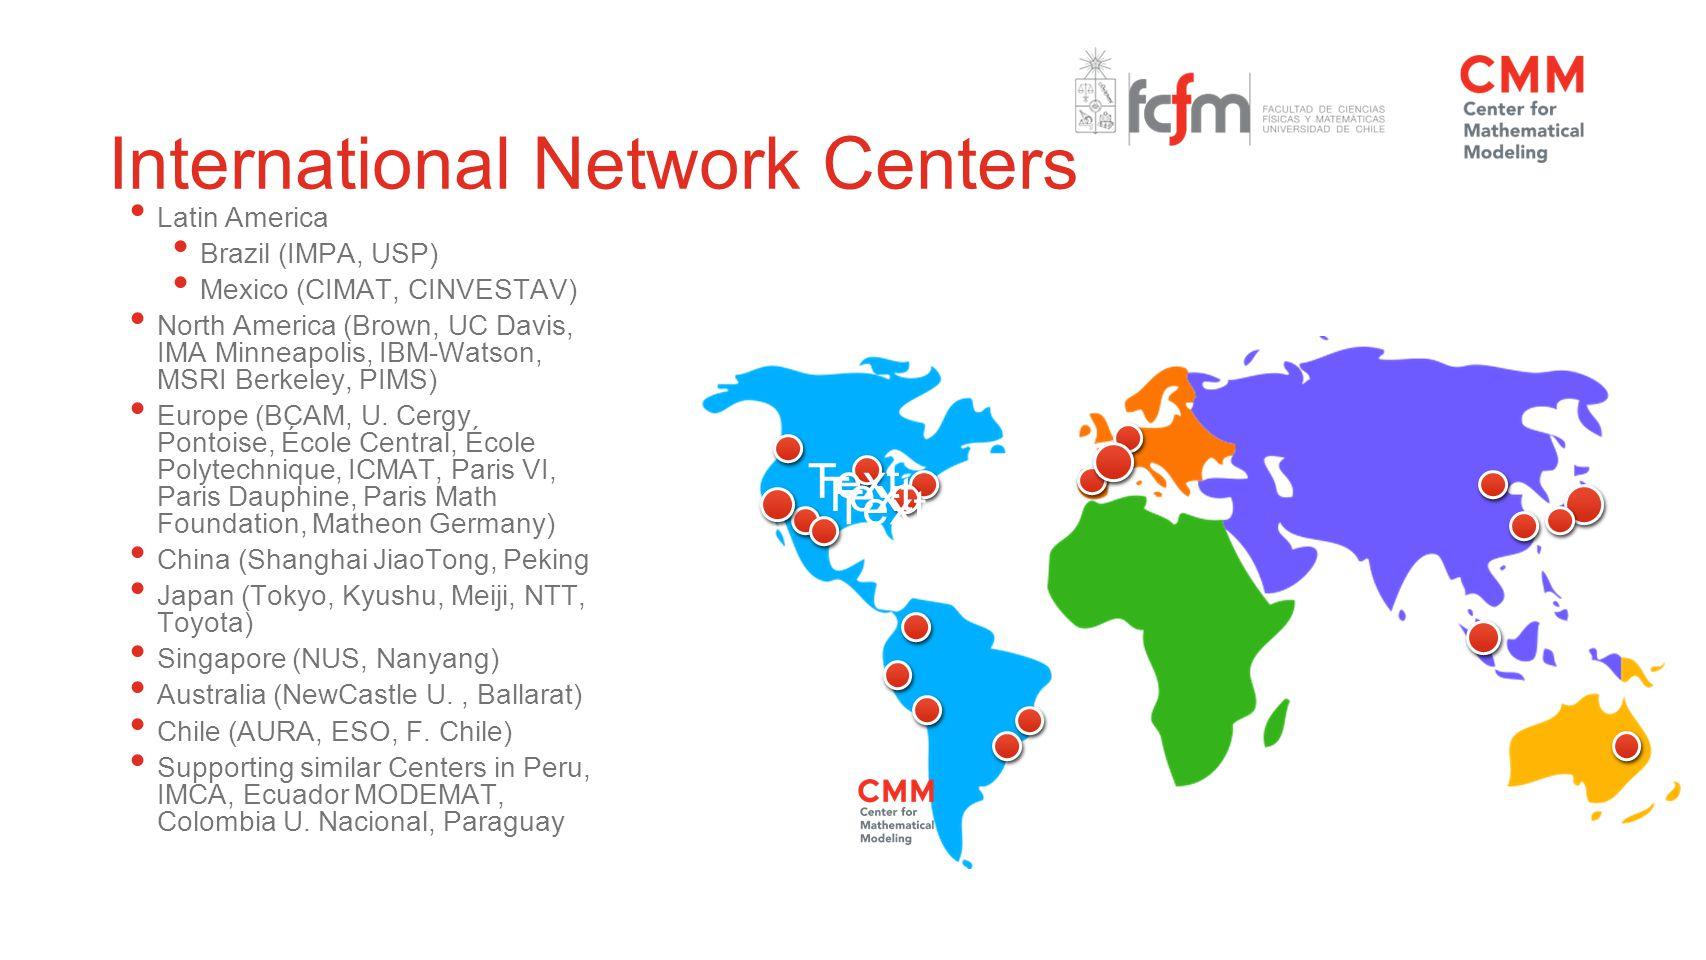 International Network Centers Latin America Brazil (IMPA, USP) Mexico (CIMAT, CINVESTAV) North America (Brown, UC Davis, IMA Minneapolis, IBM-Watson, MSRI Berkeley, PIMS) Europe (BCAM, U.